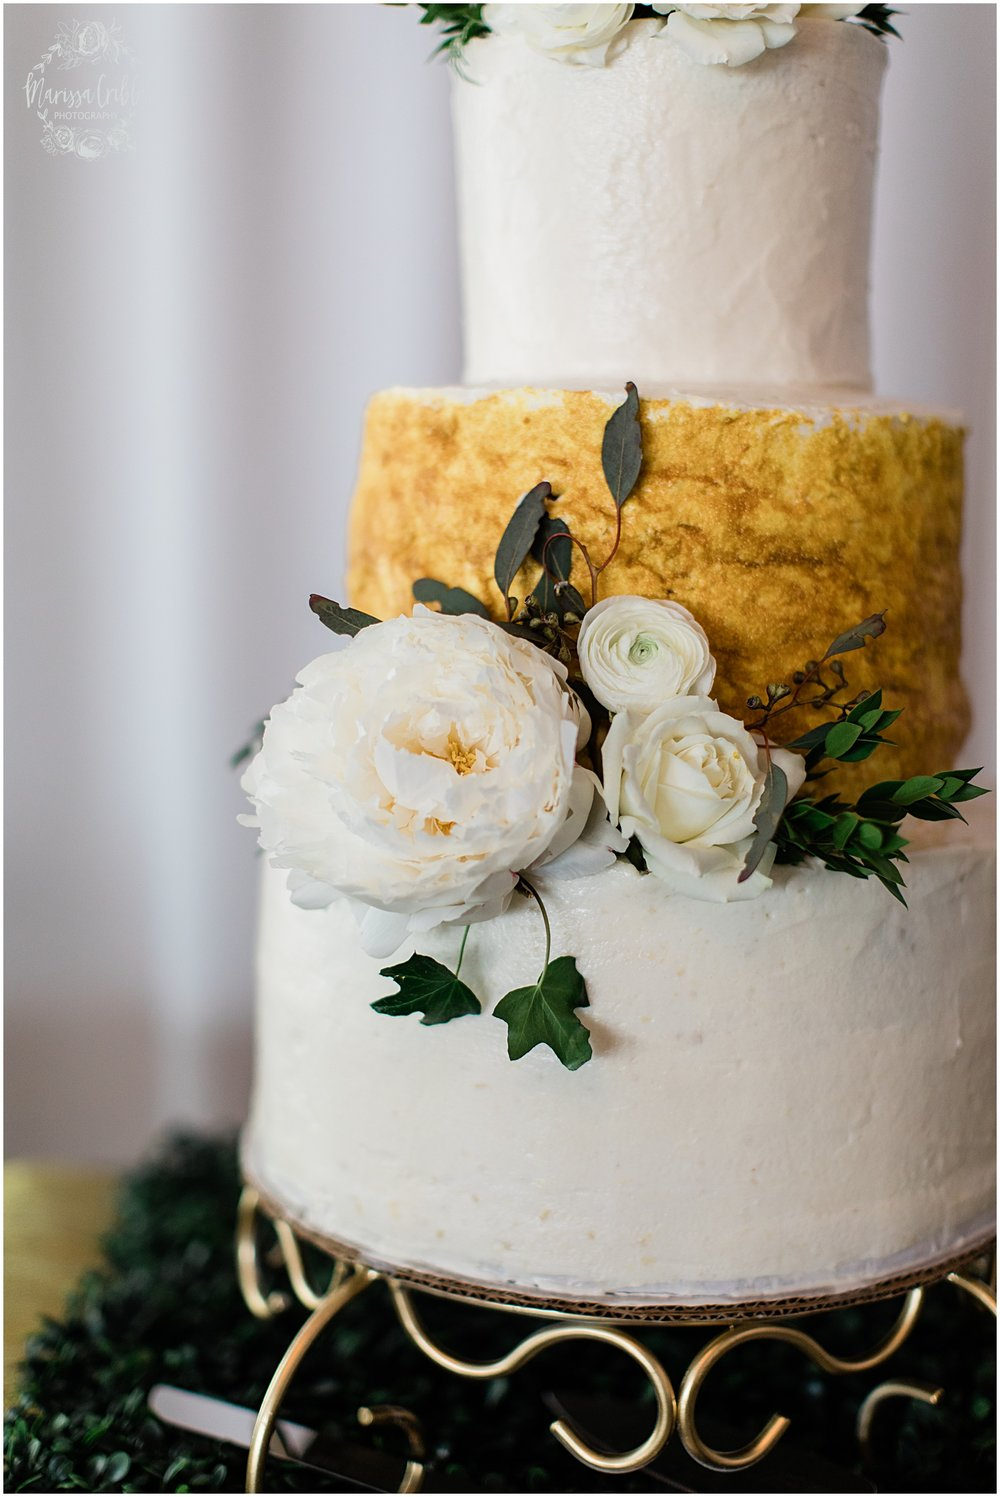 GORBY WEDDING | MARISSA CRIBBS PHOTOGRAPHY_5116.jpg